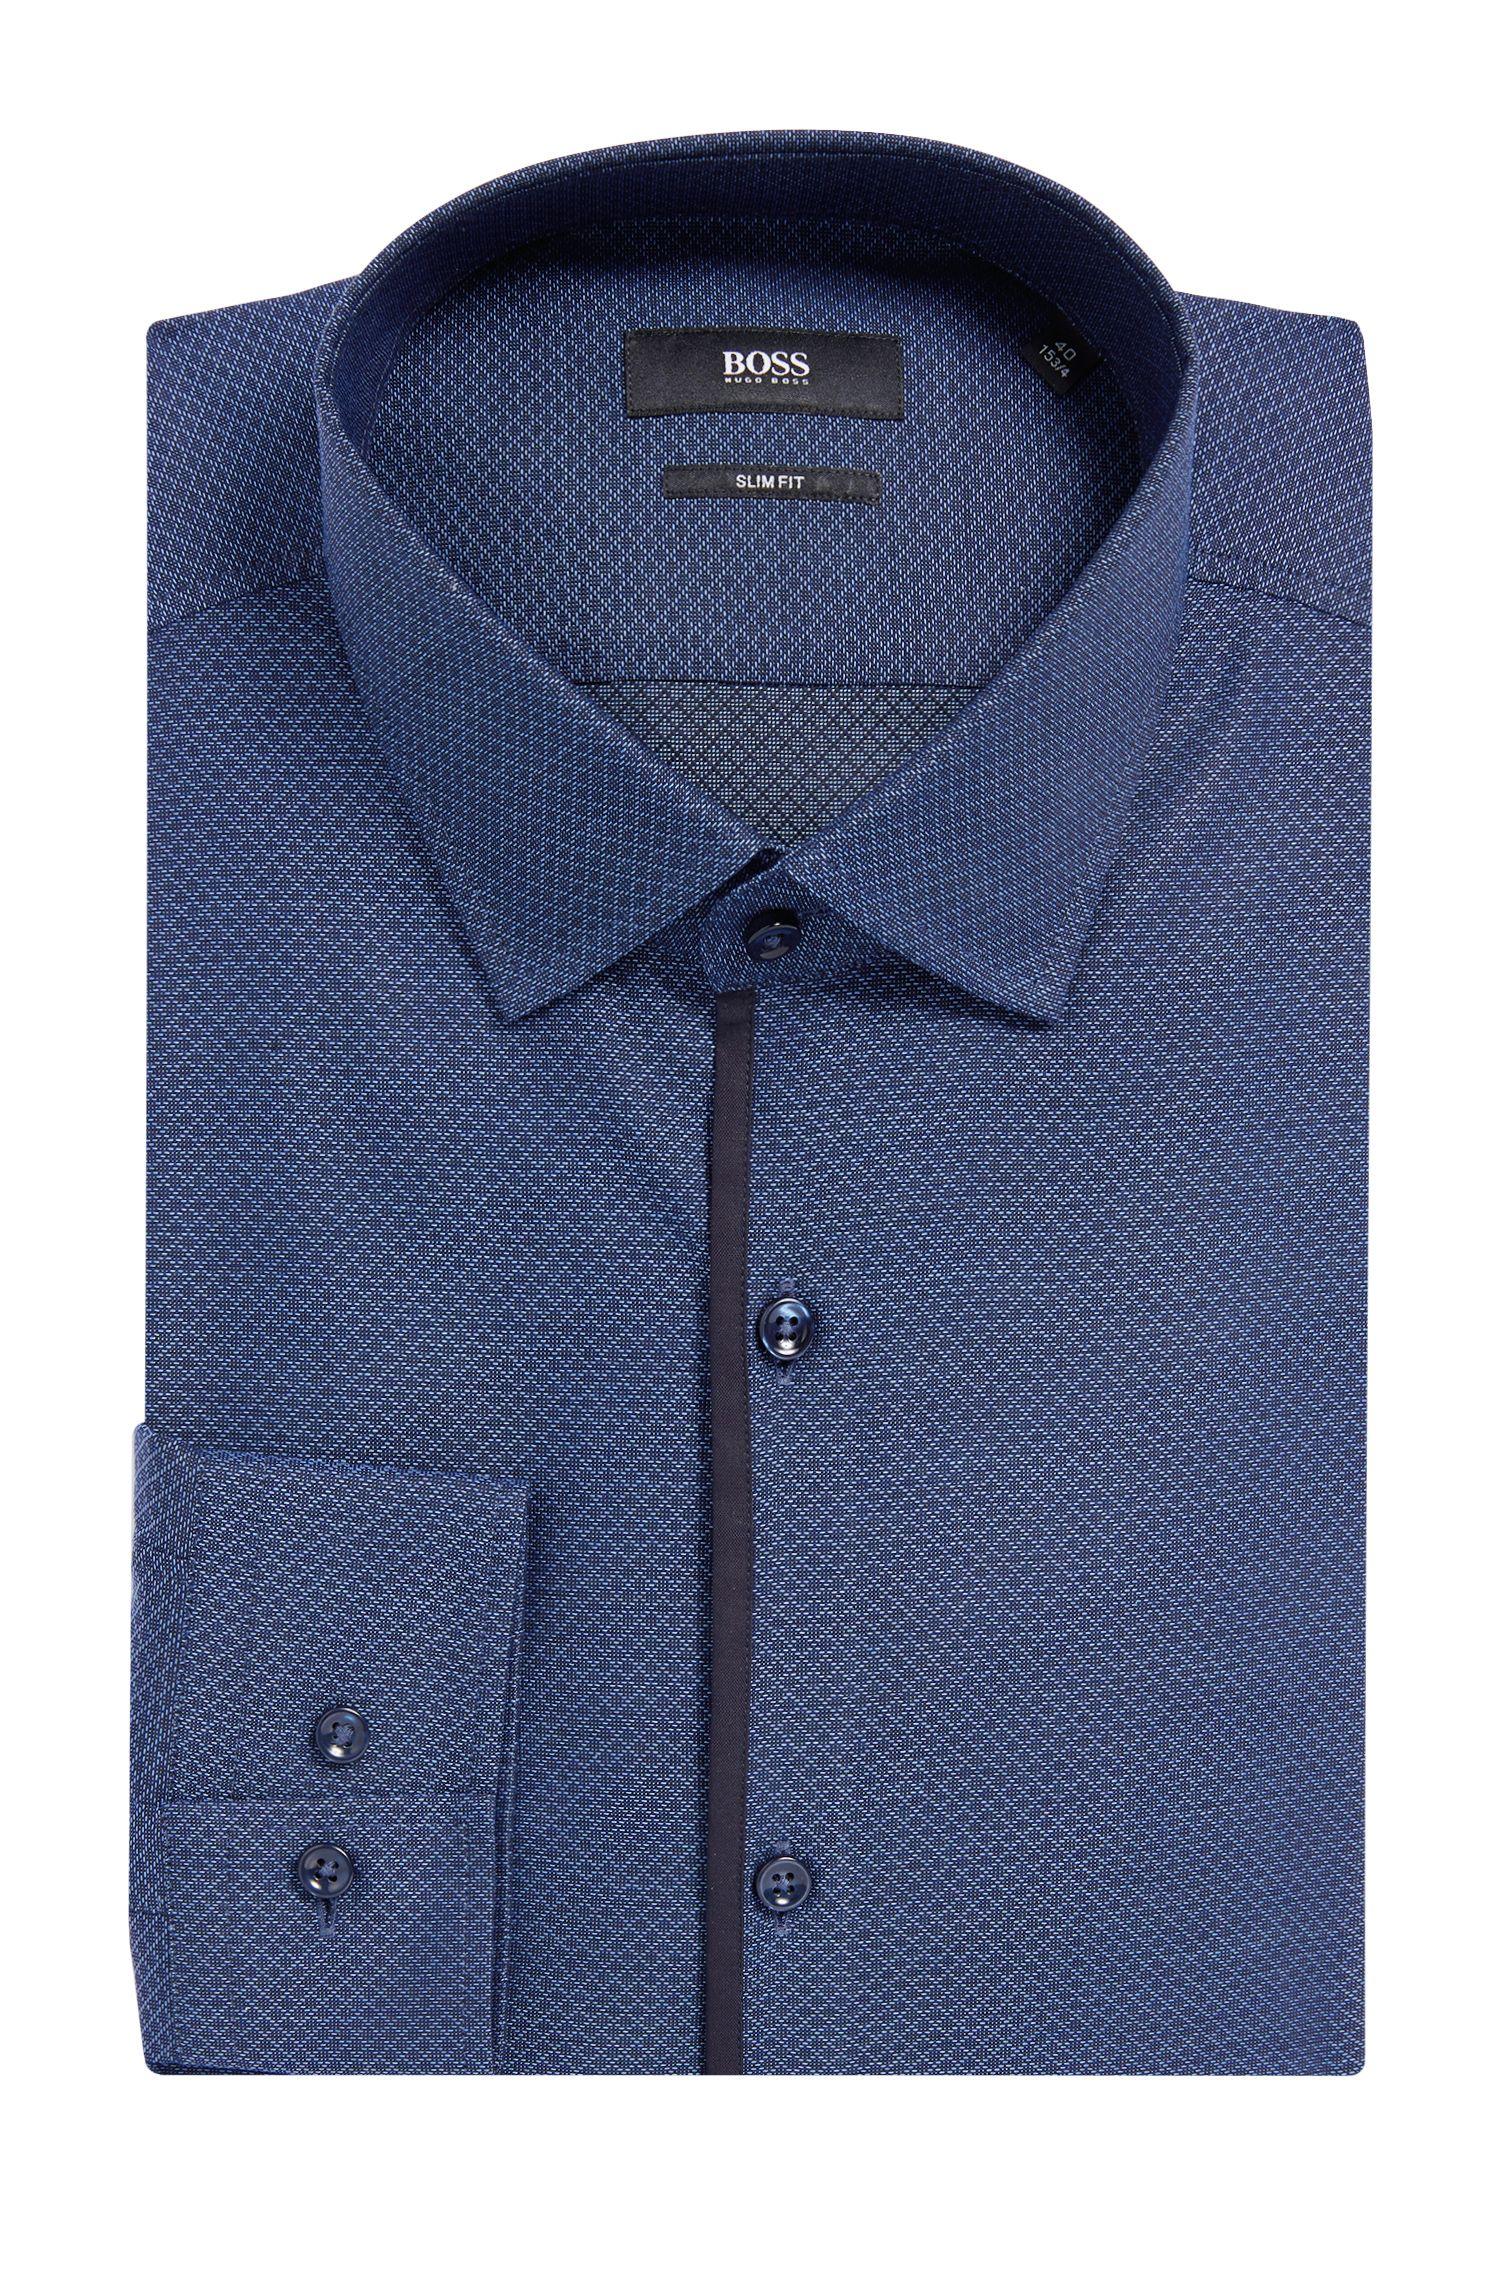 Diamond Pattern Cotton Dress Shirt, Slim Fit | Jeldrik